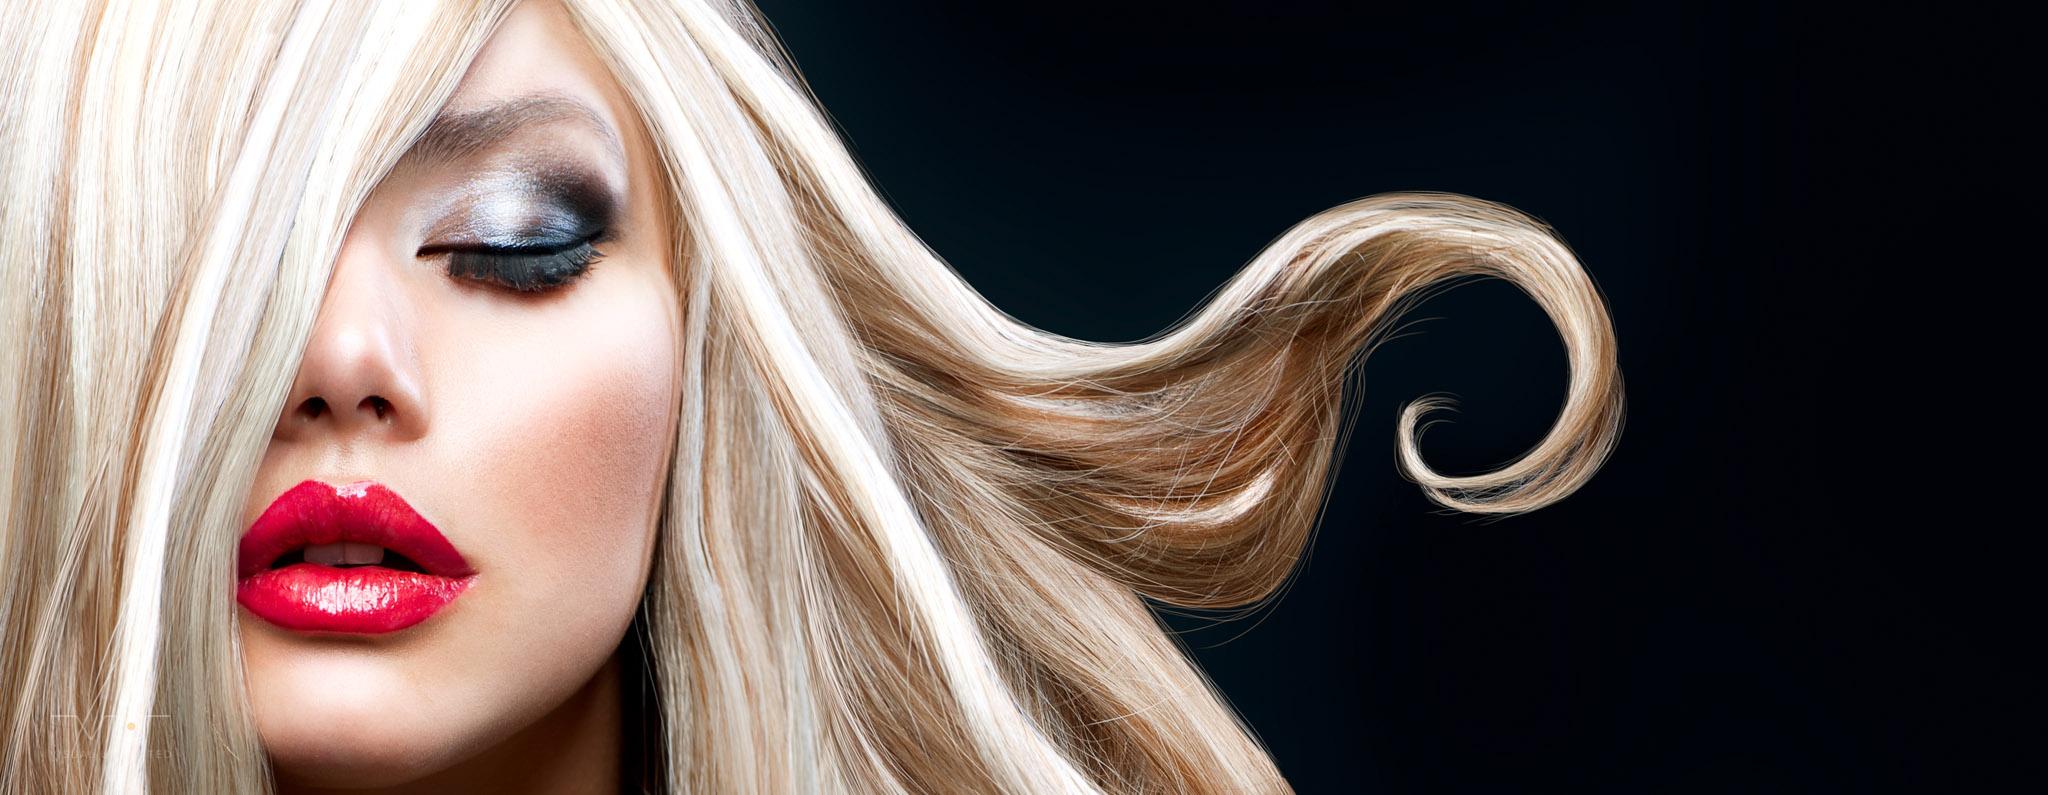 Bilder VU Header Photography 08 Blonde Locken - Curly Hair